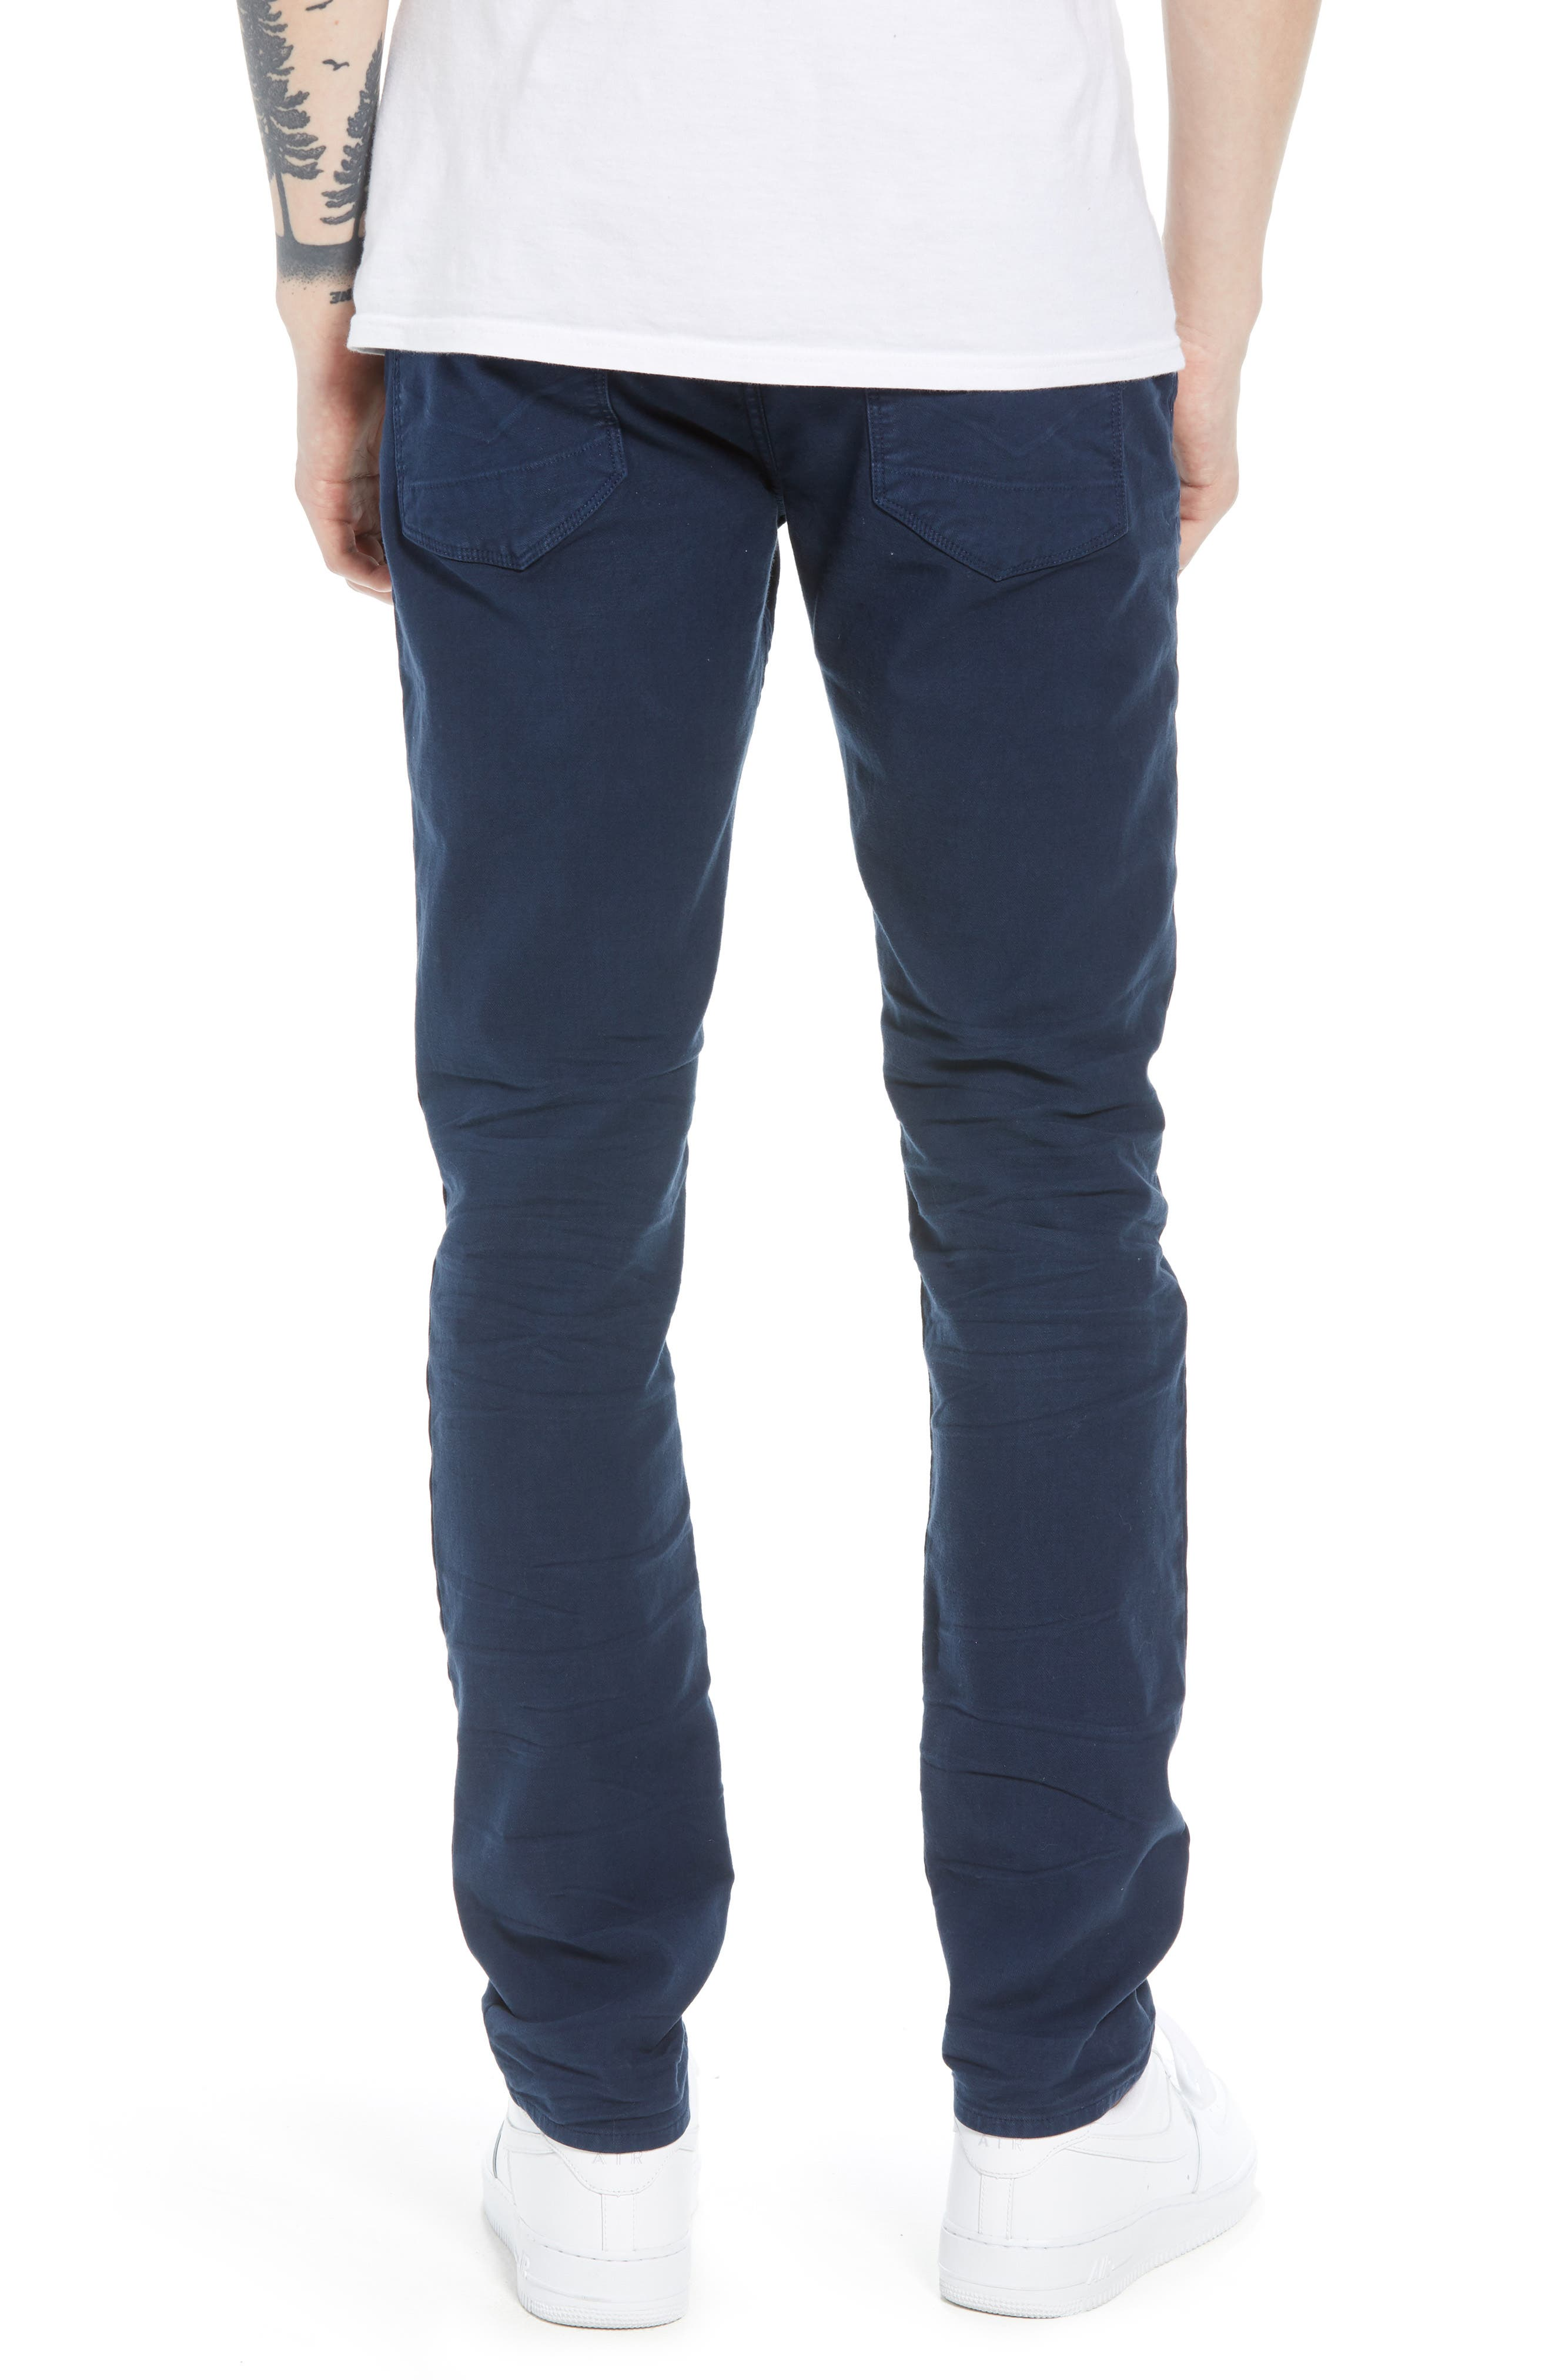 Hudson Axl Skinny Fit Jeans,                             Alternate thumbnail 2, color,                             SAILOR BLUE